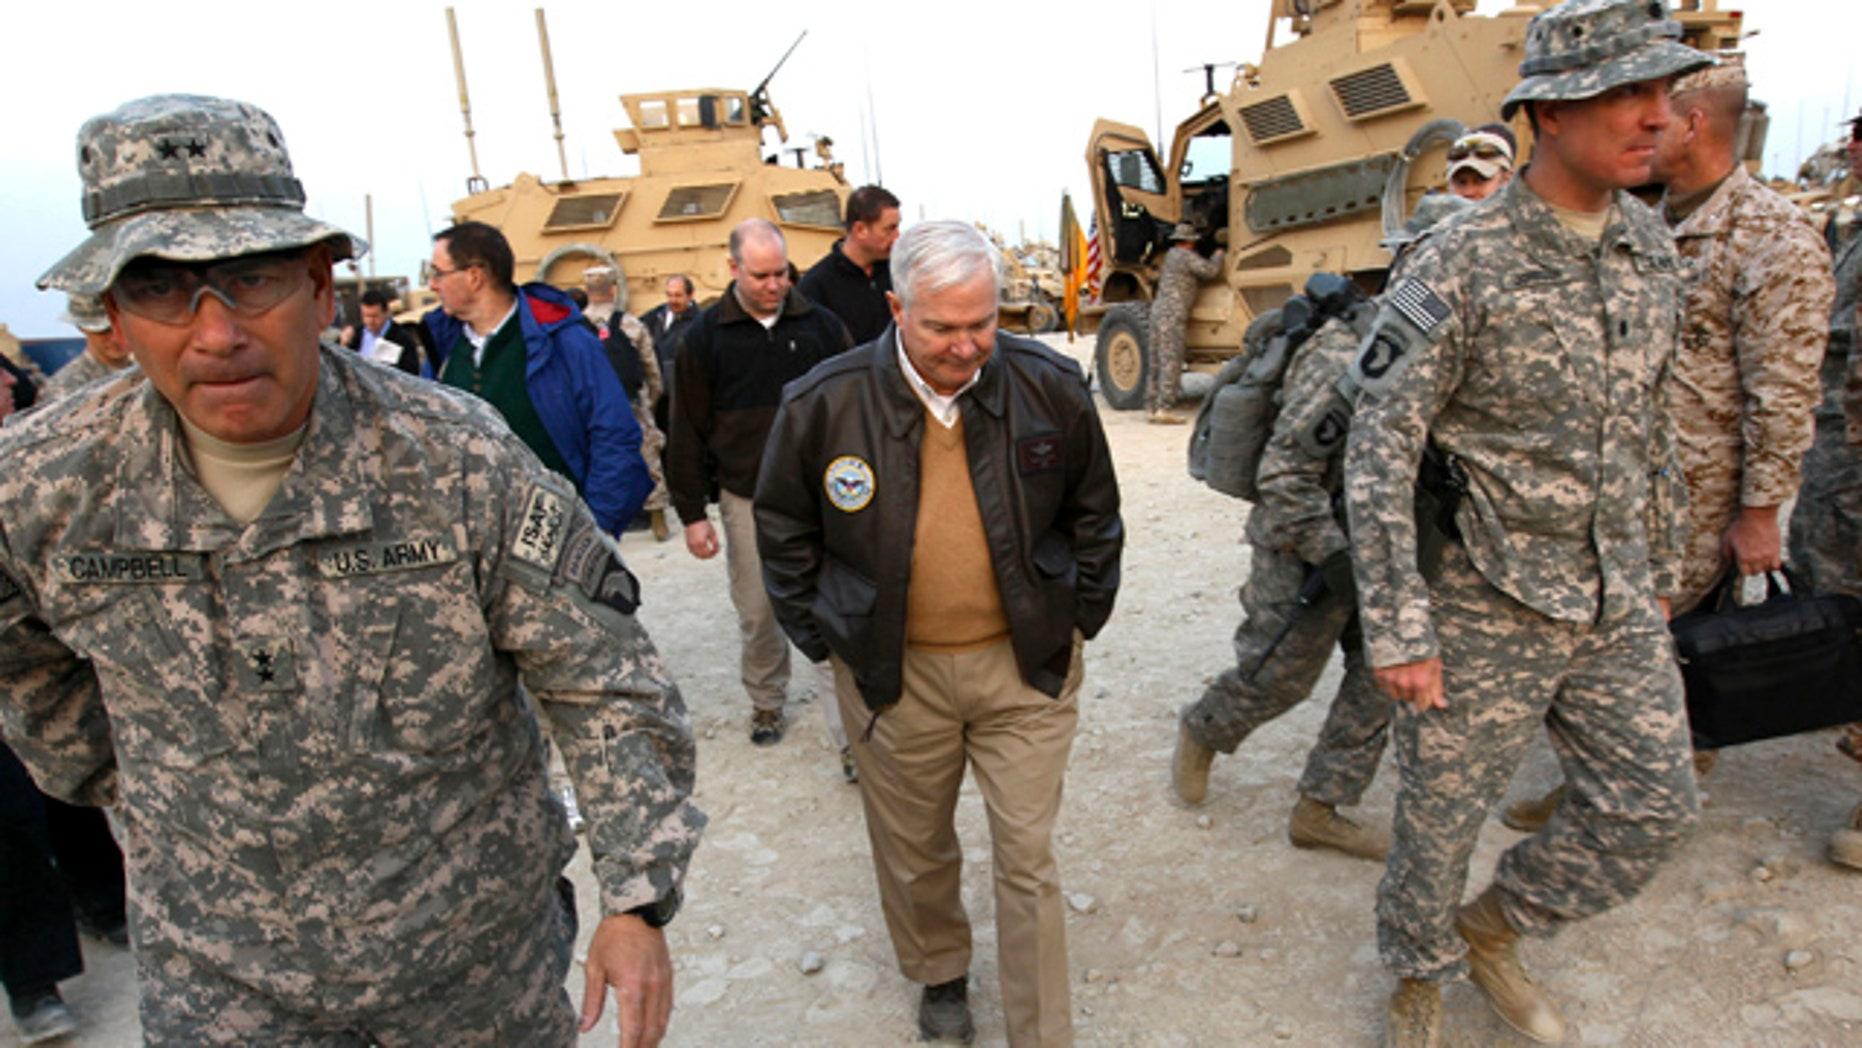 Dec. 7: Defense Secretary Robert Gates walks with Maj. Gen. John Campbell, left,, commanding general of the 101st Air Assault, in Kunar Province, Afghanistan in Afghanistan.